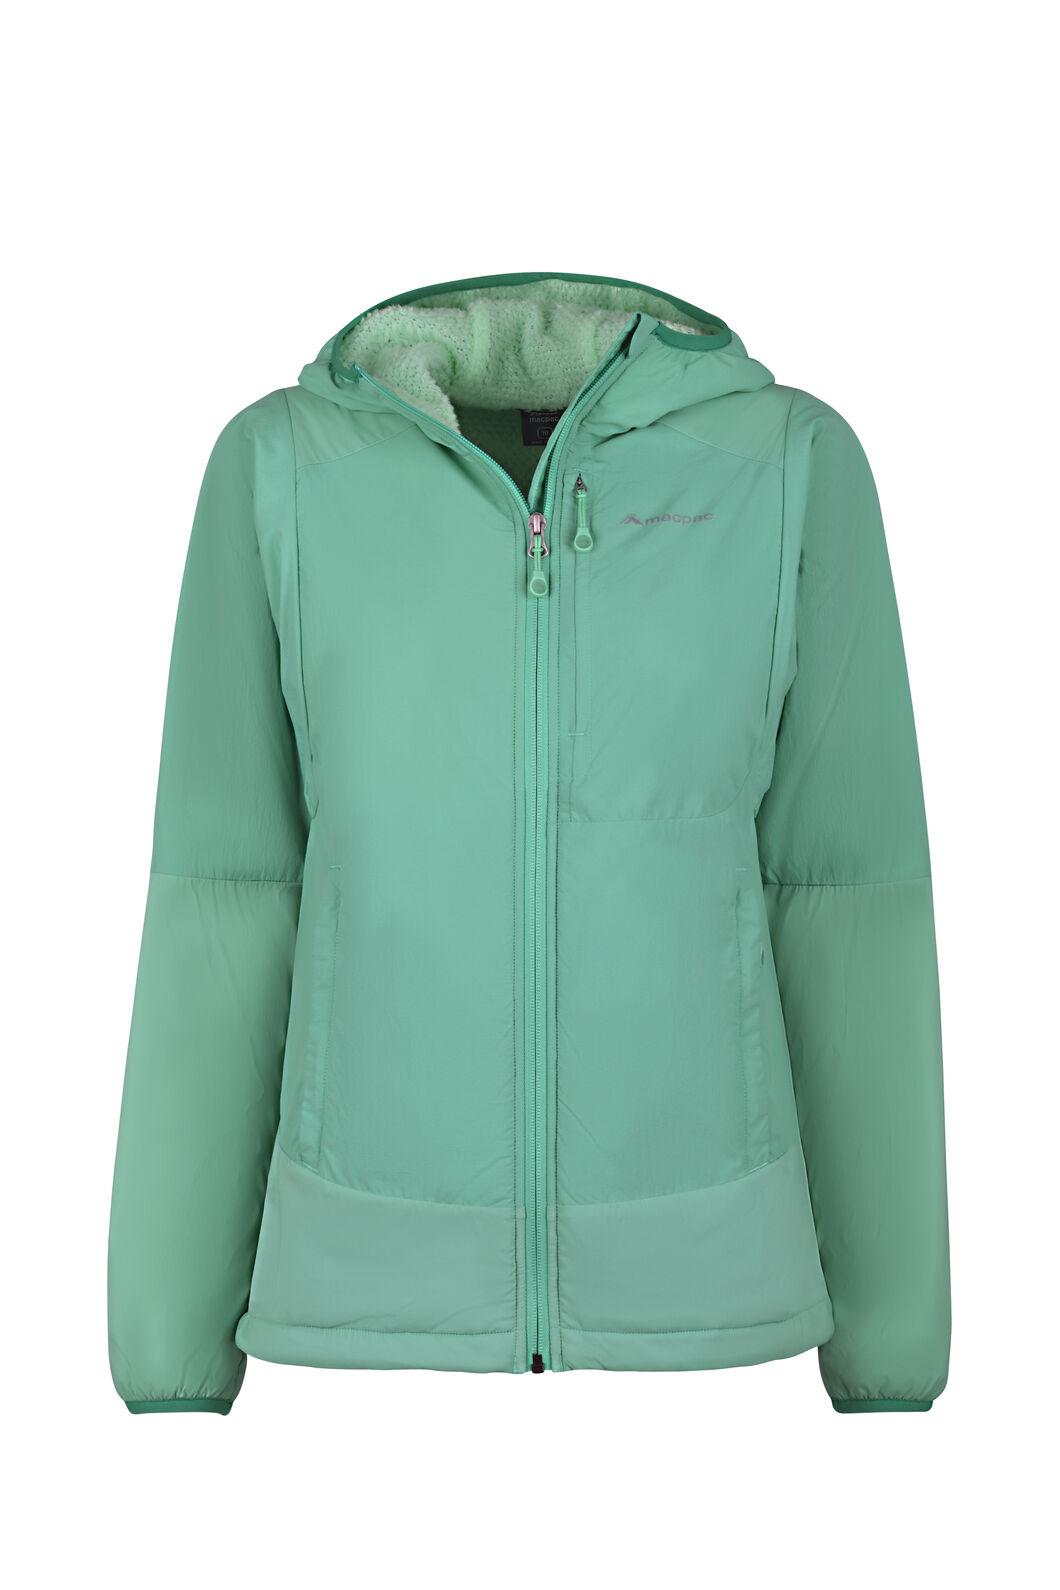 Macpac Pisa Polartec® Hooded Jacket - Women's, Turquoise/Beach Glass, hi-res